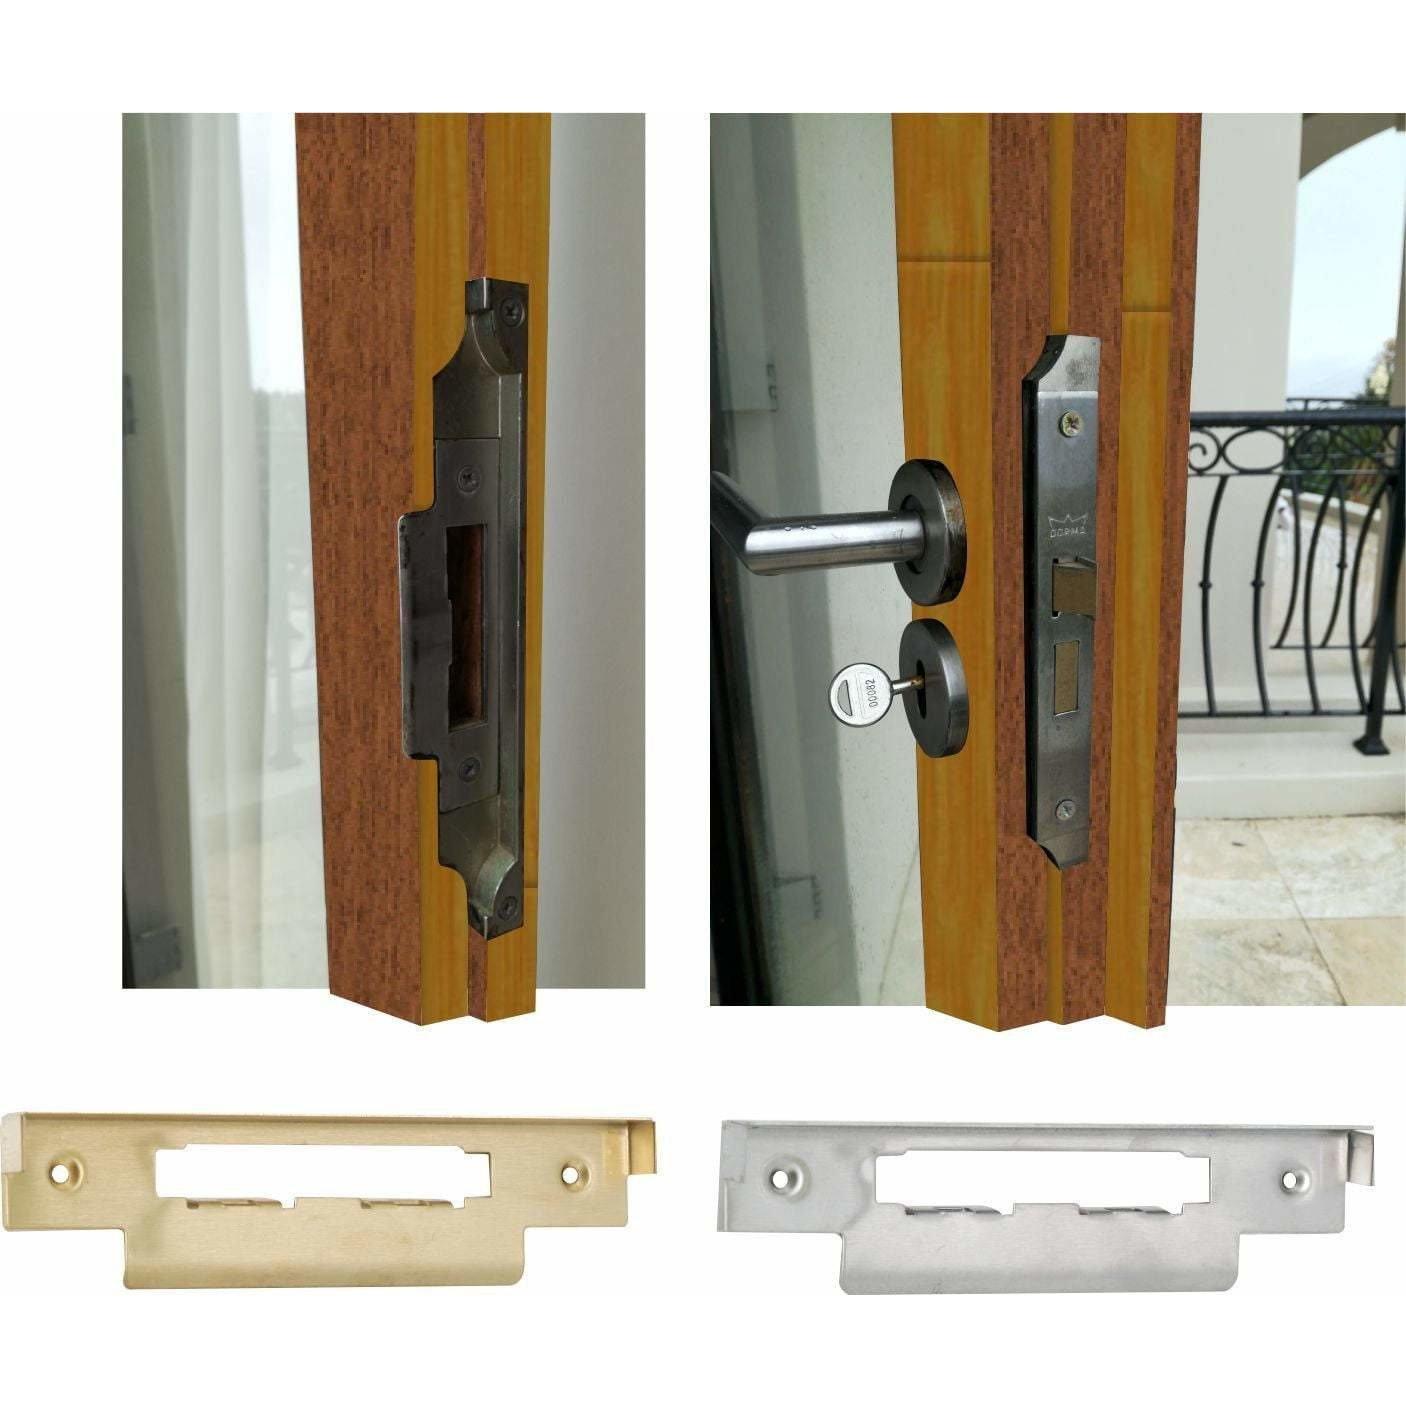 Rebate kit for mortise cylinder lock (ML-262)